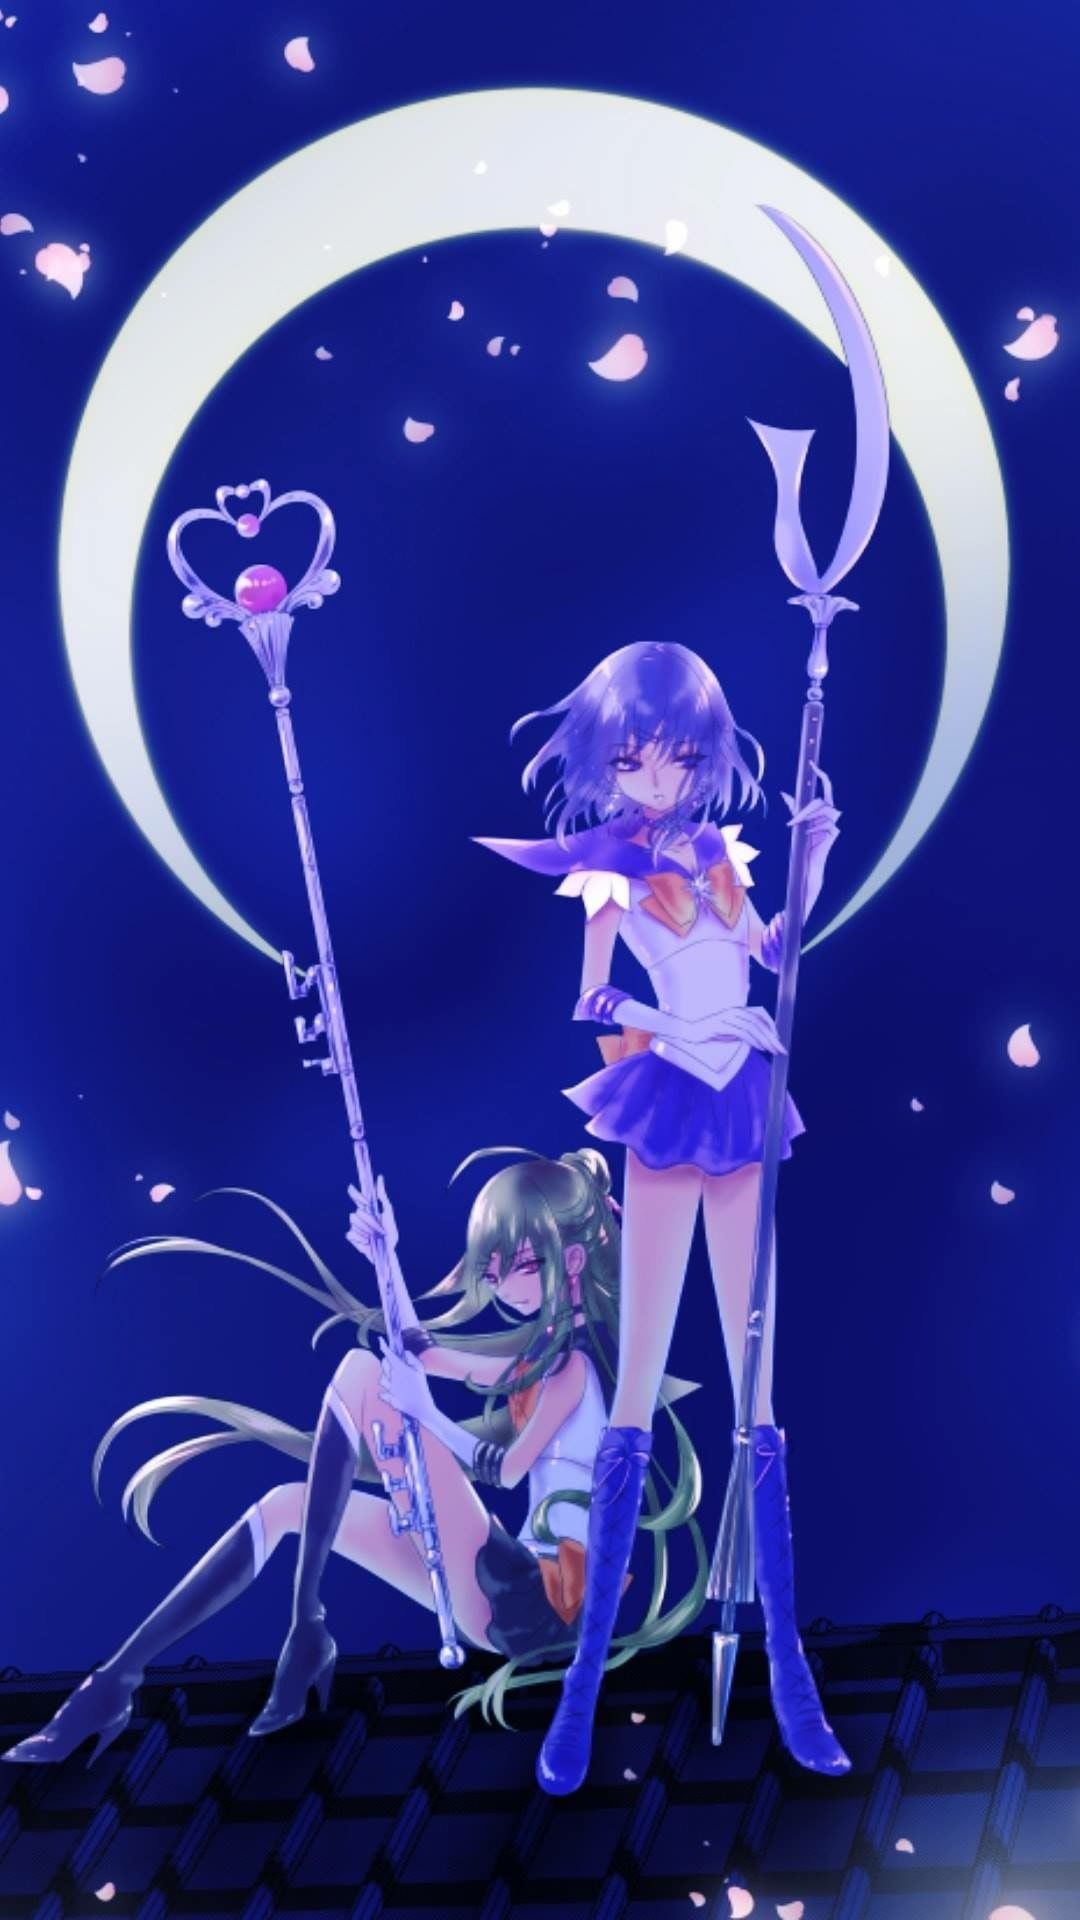 Sailor Moon Crystal 20th anniversary plush Pluto Saturn Neptune Uranus Chibi